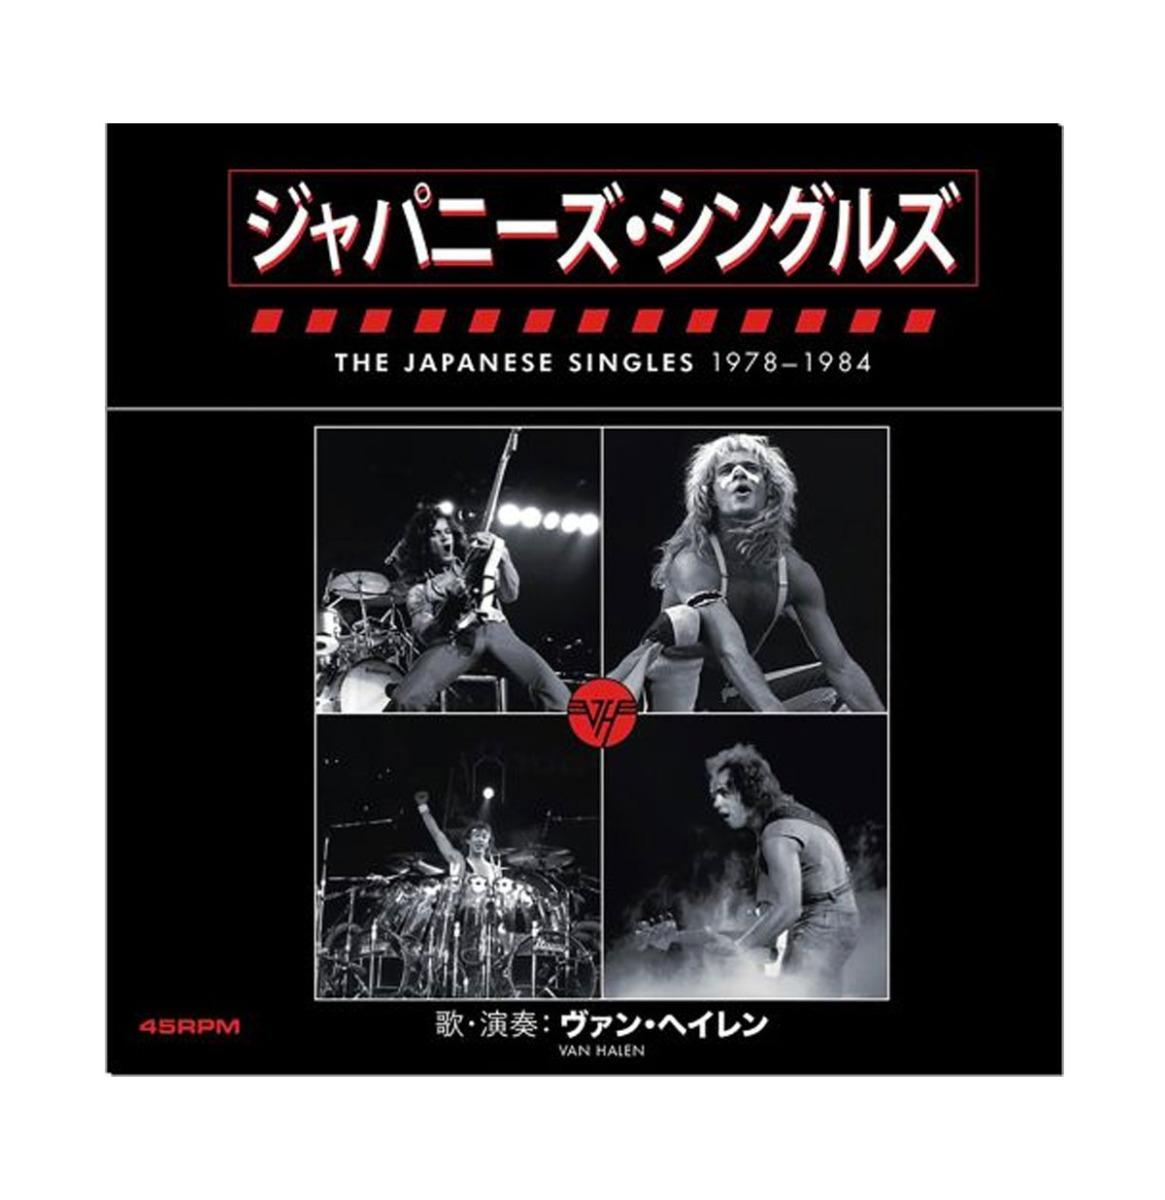 "GELIMITEERDE EDITIE Van Halen - The Japanese Singles 1978 - 1984 Box van 13 Singles 7"""